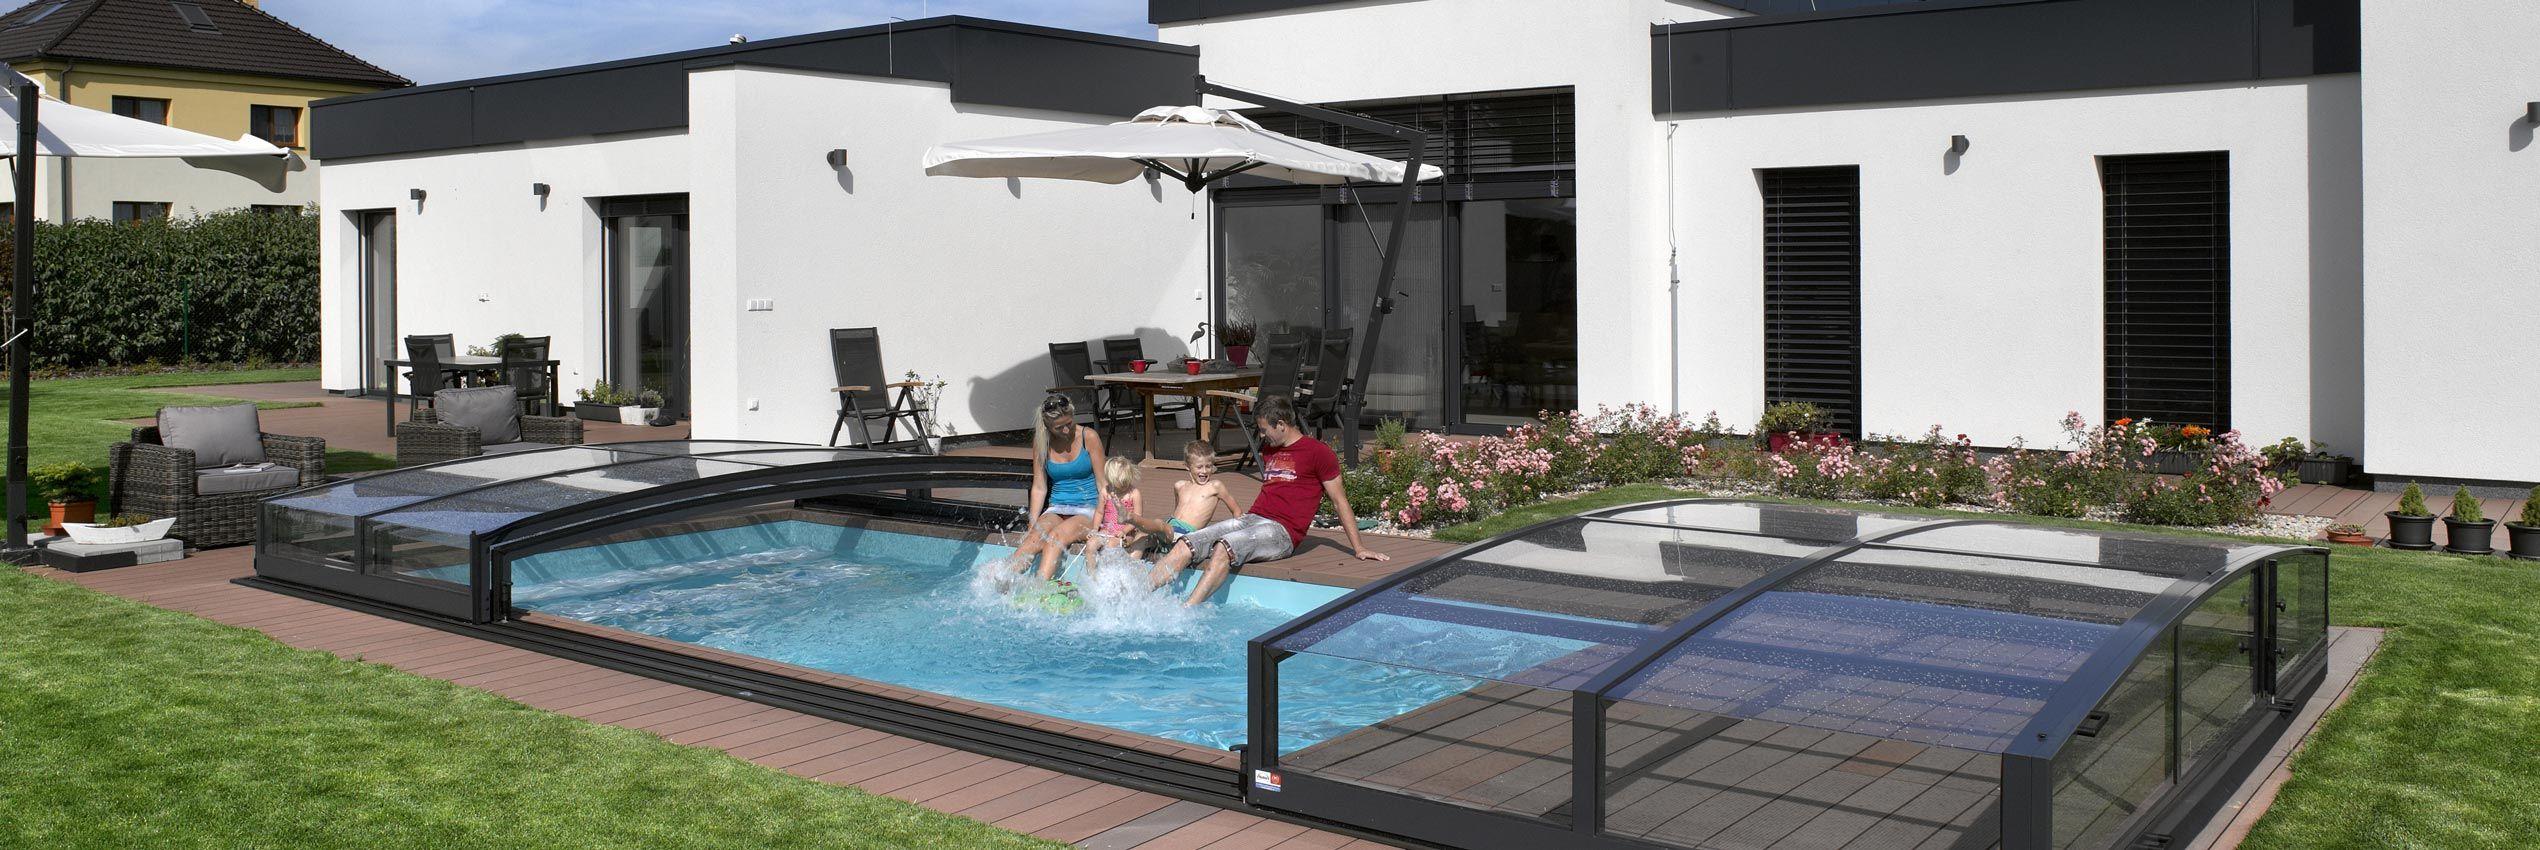 Teilweise aufgeschobene Poolüberdachung Viva